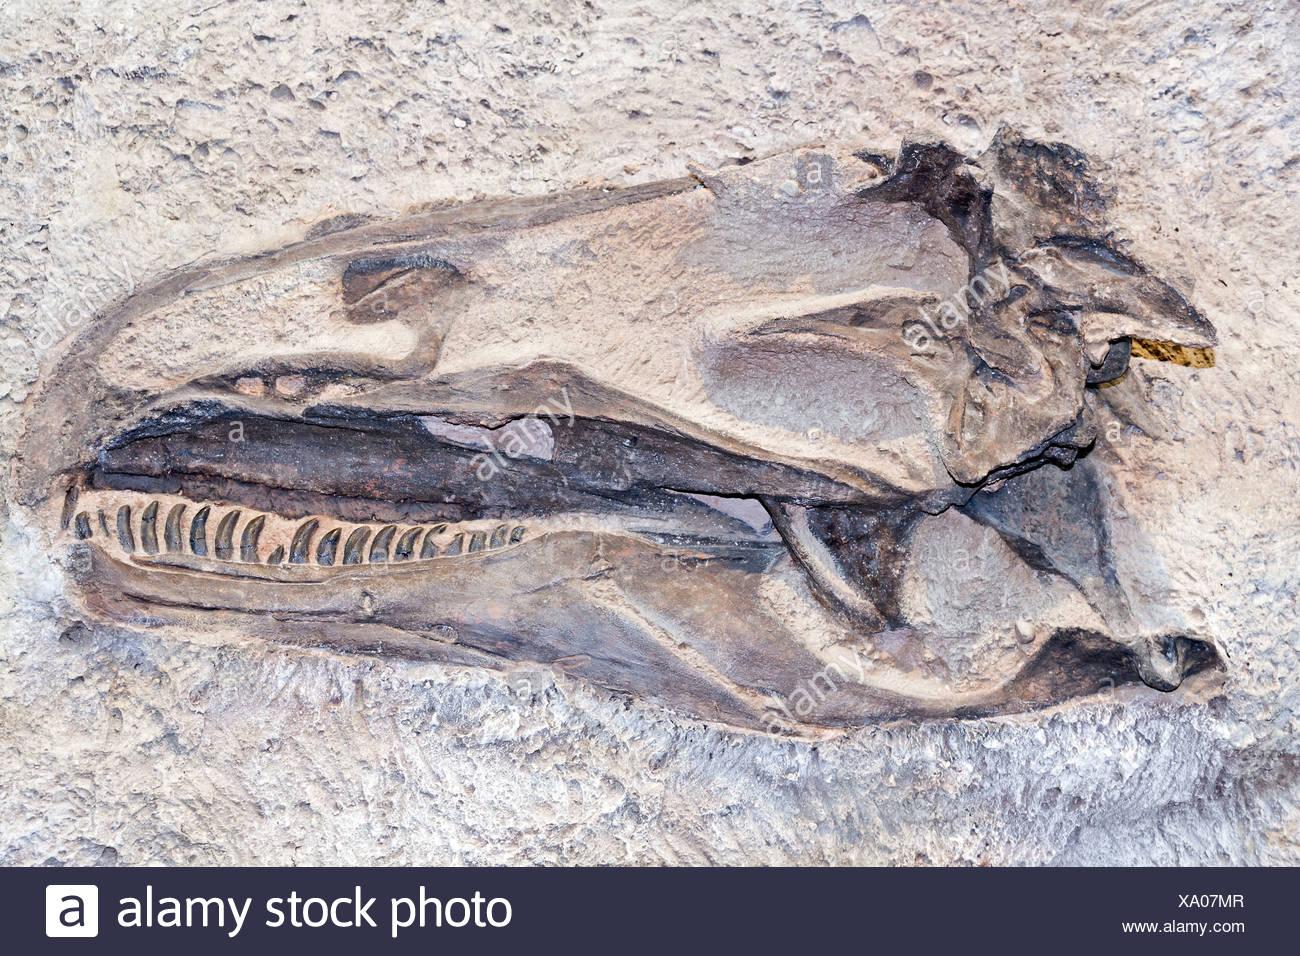 dinosaur fossil - Stock Image